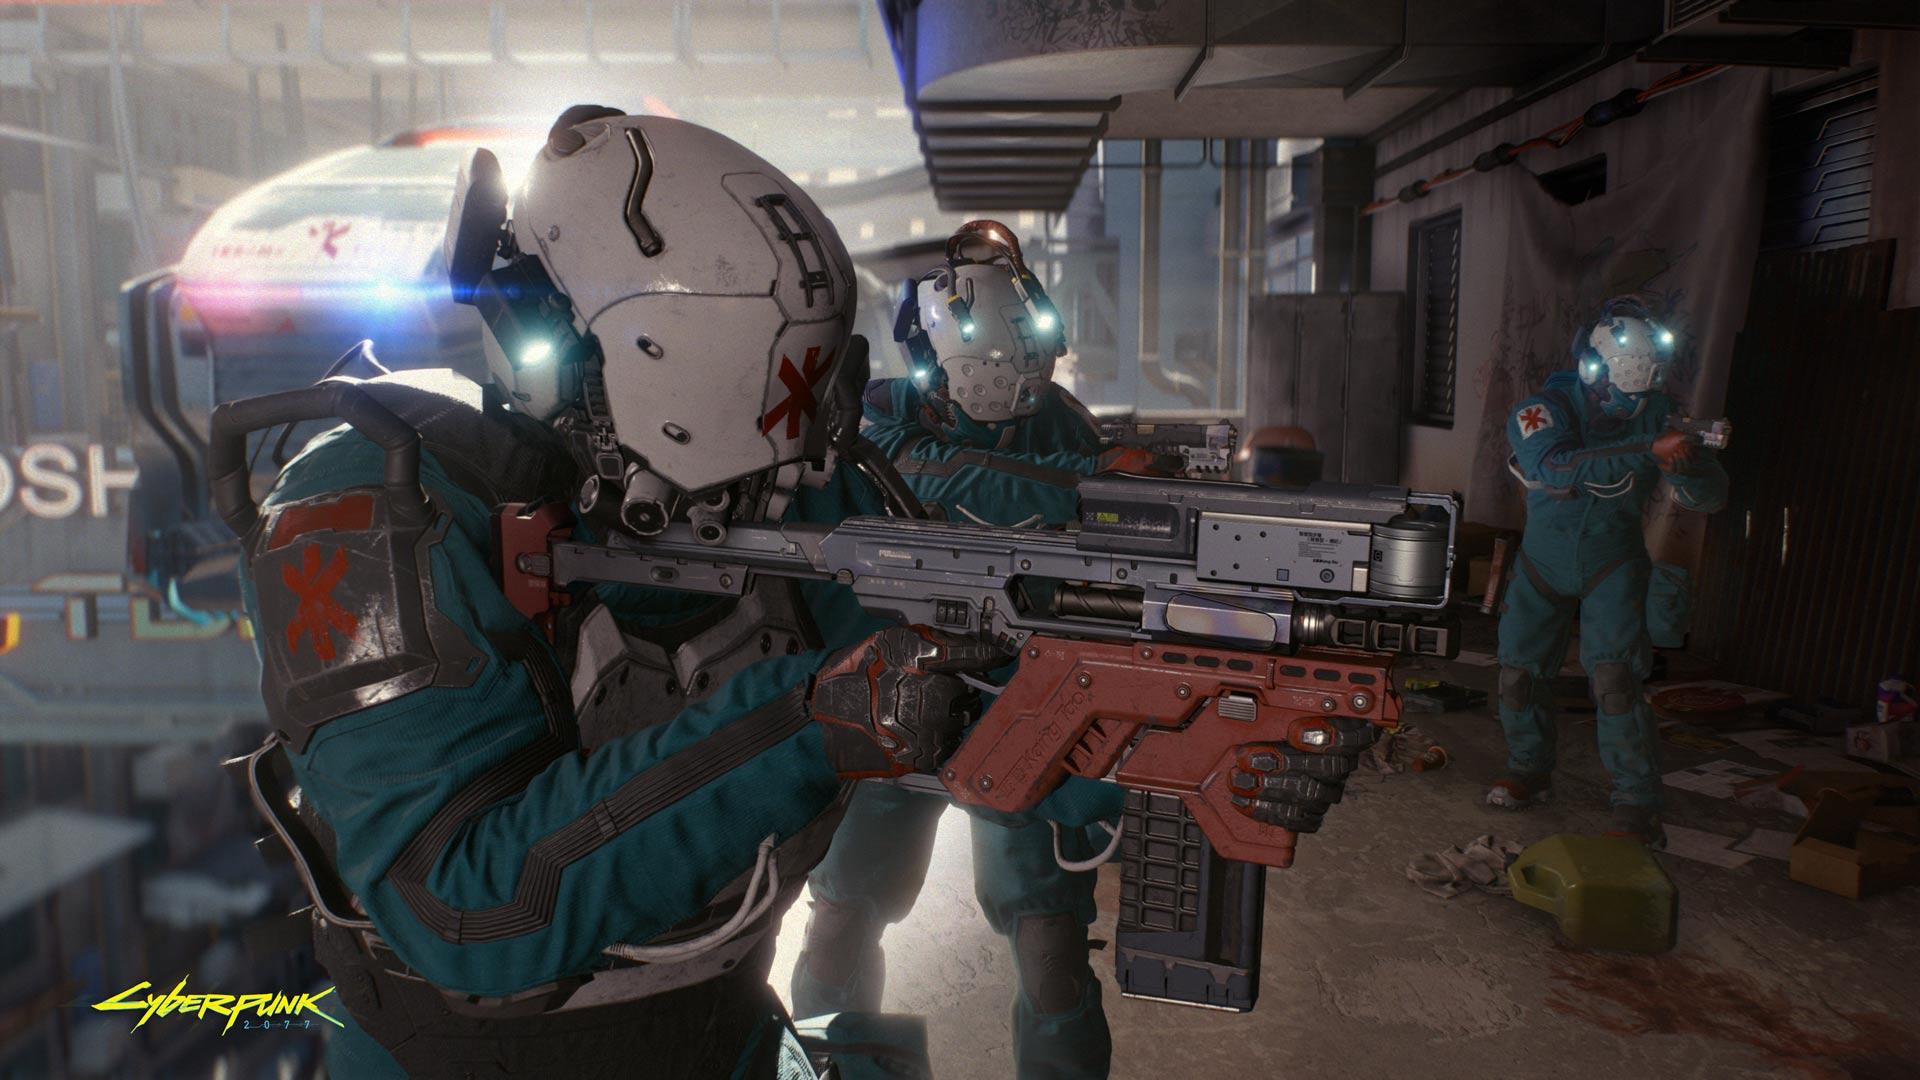 Cyberpunk 2077 Shock to save shoot to kill